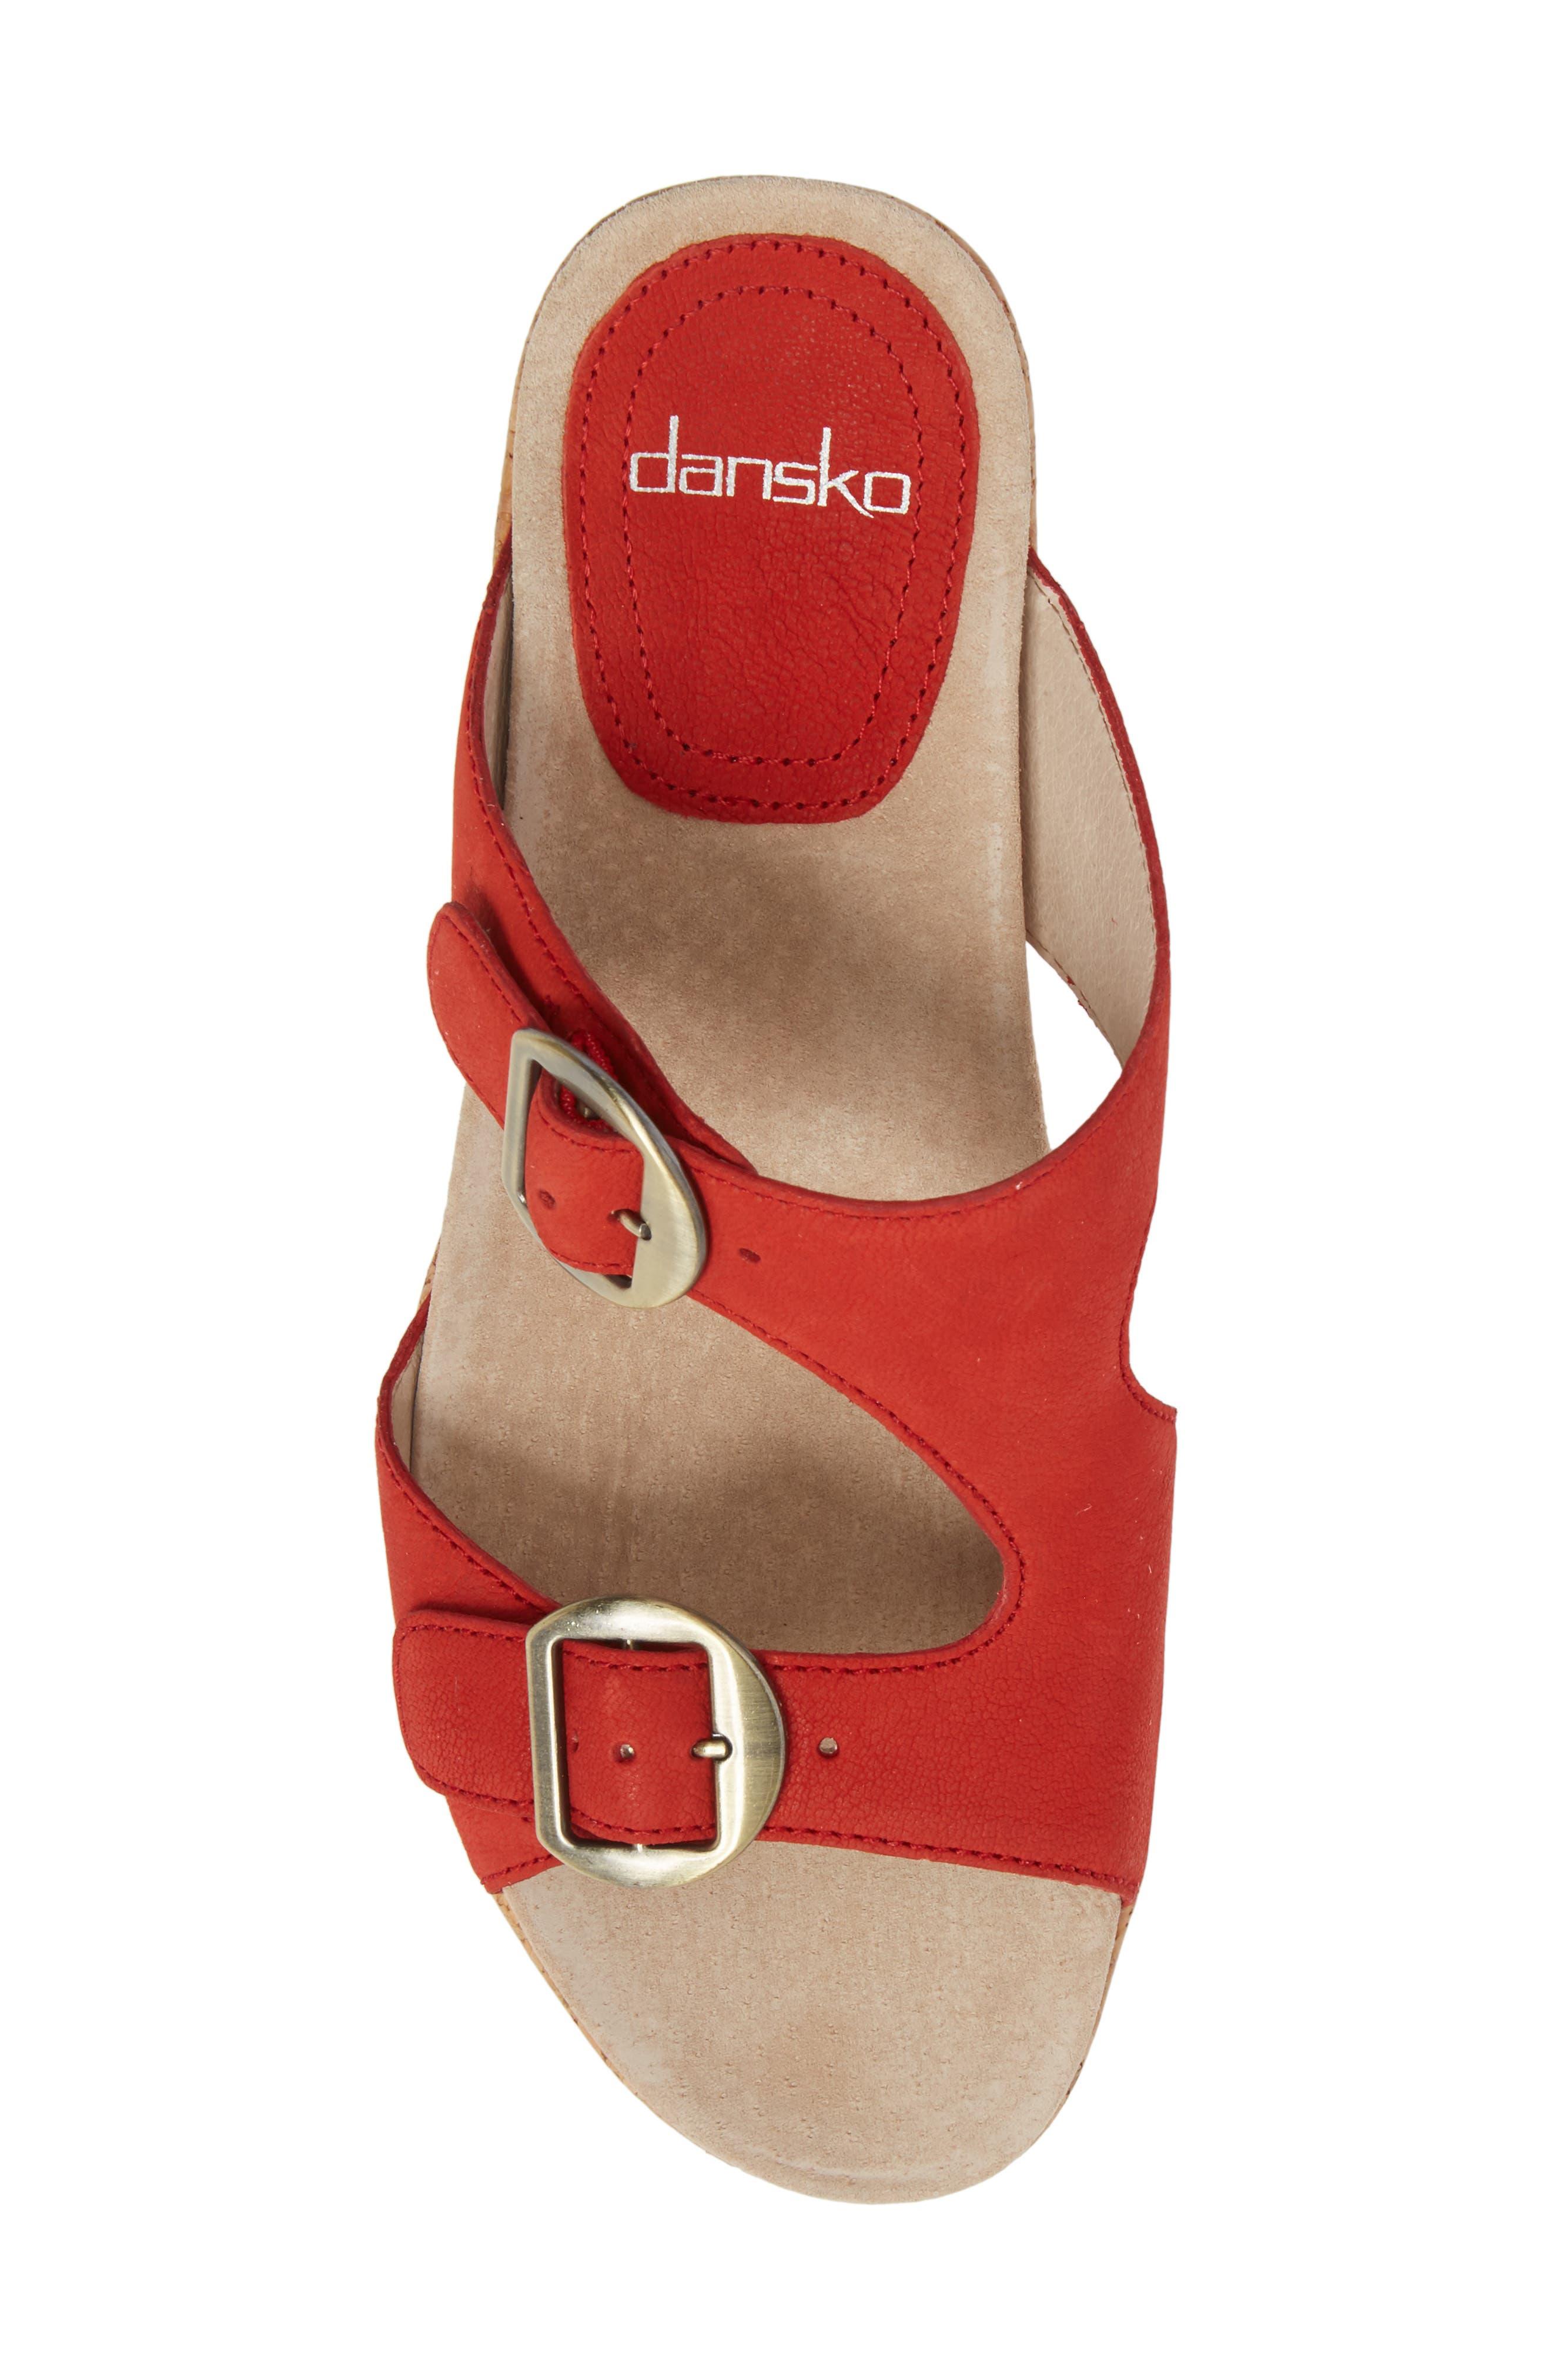 Carla Wedge Slide Sandal,                             Alternate thumbnail 5, color,                             Tomato Milled Nubuck Leather